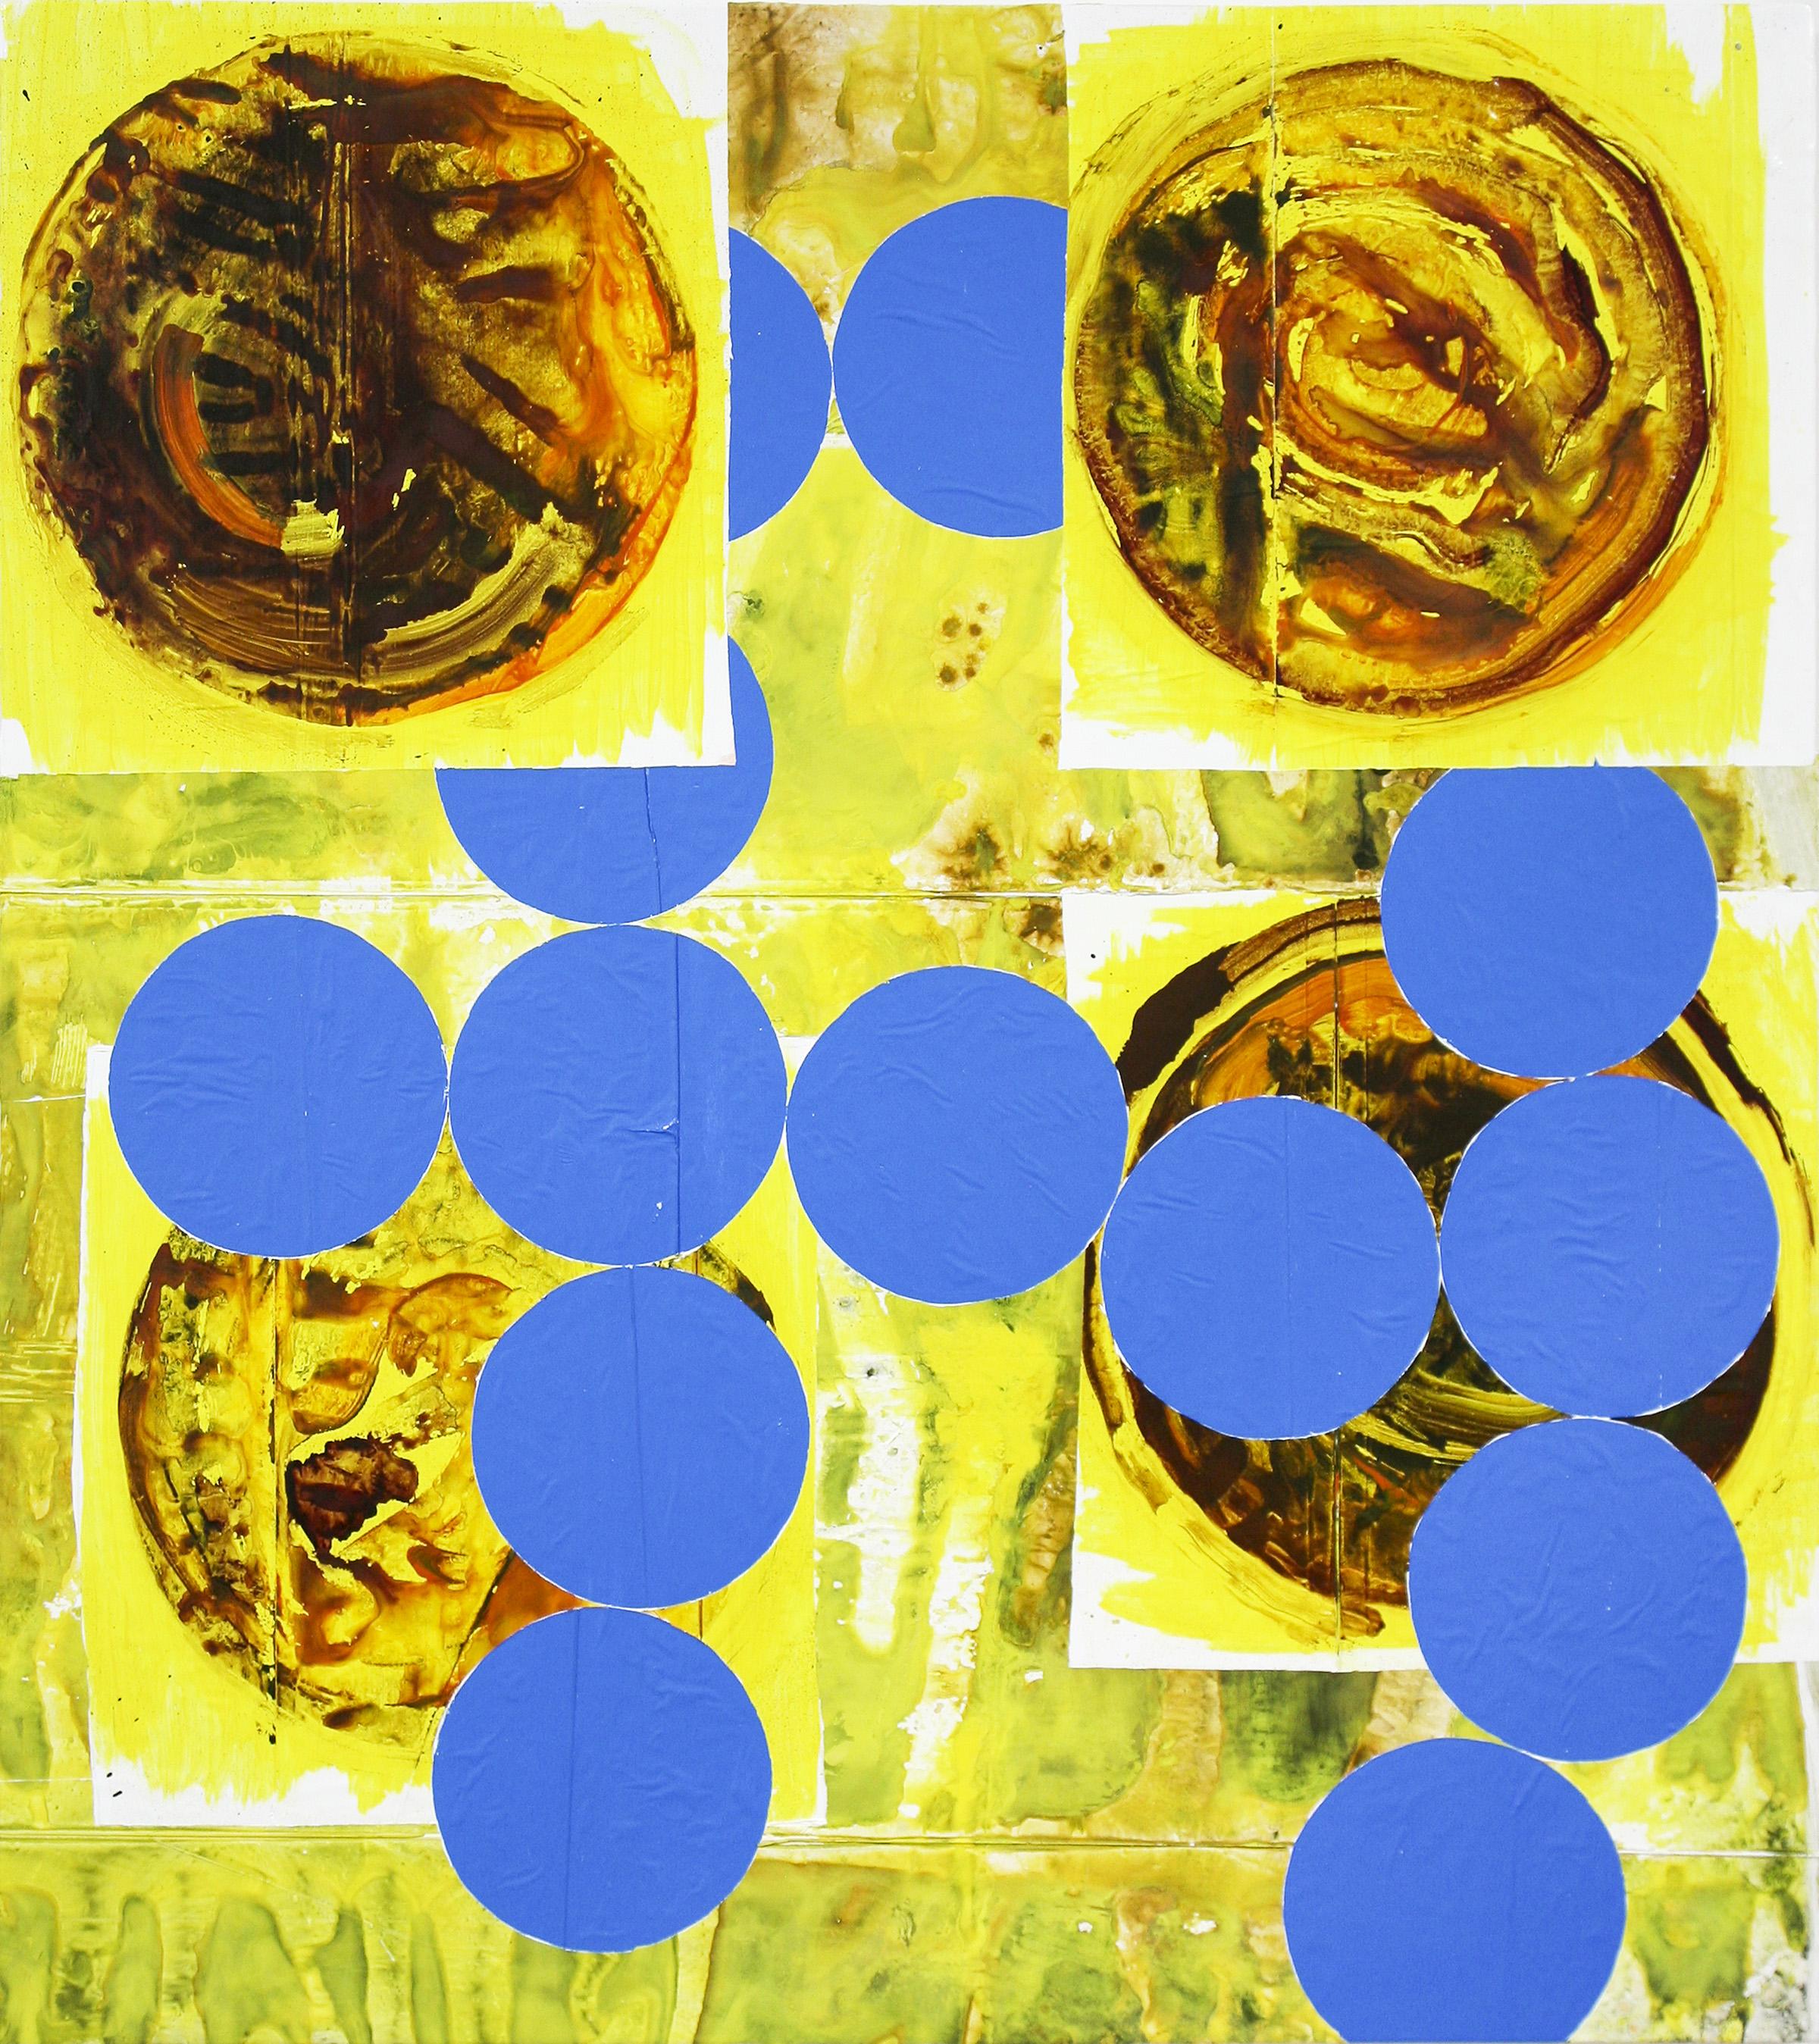 TolbertShane-Untitled4-2017-AcrylicOnCanvas-54x48-HR